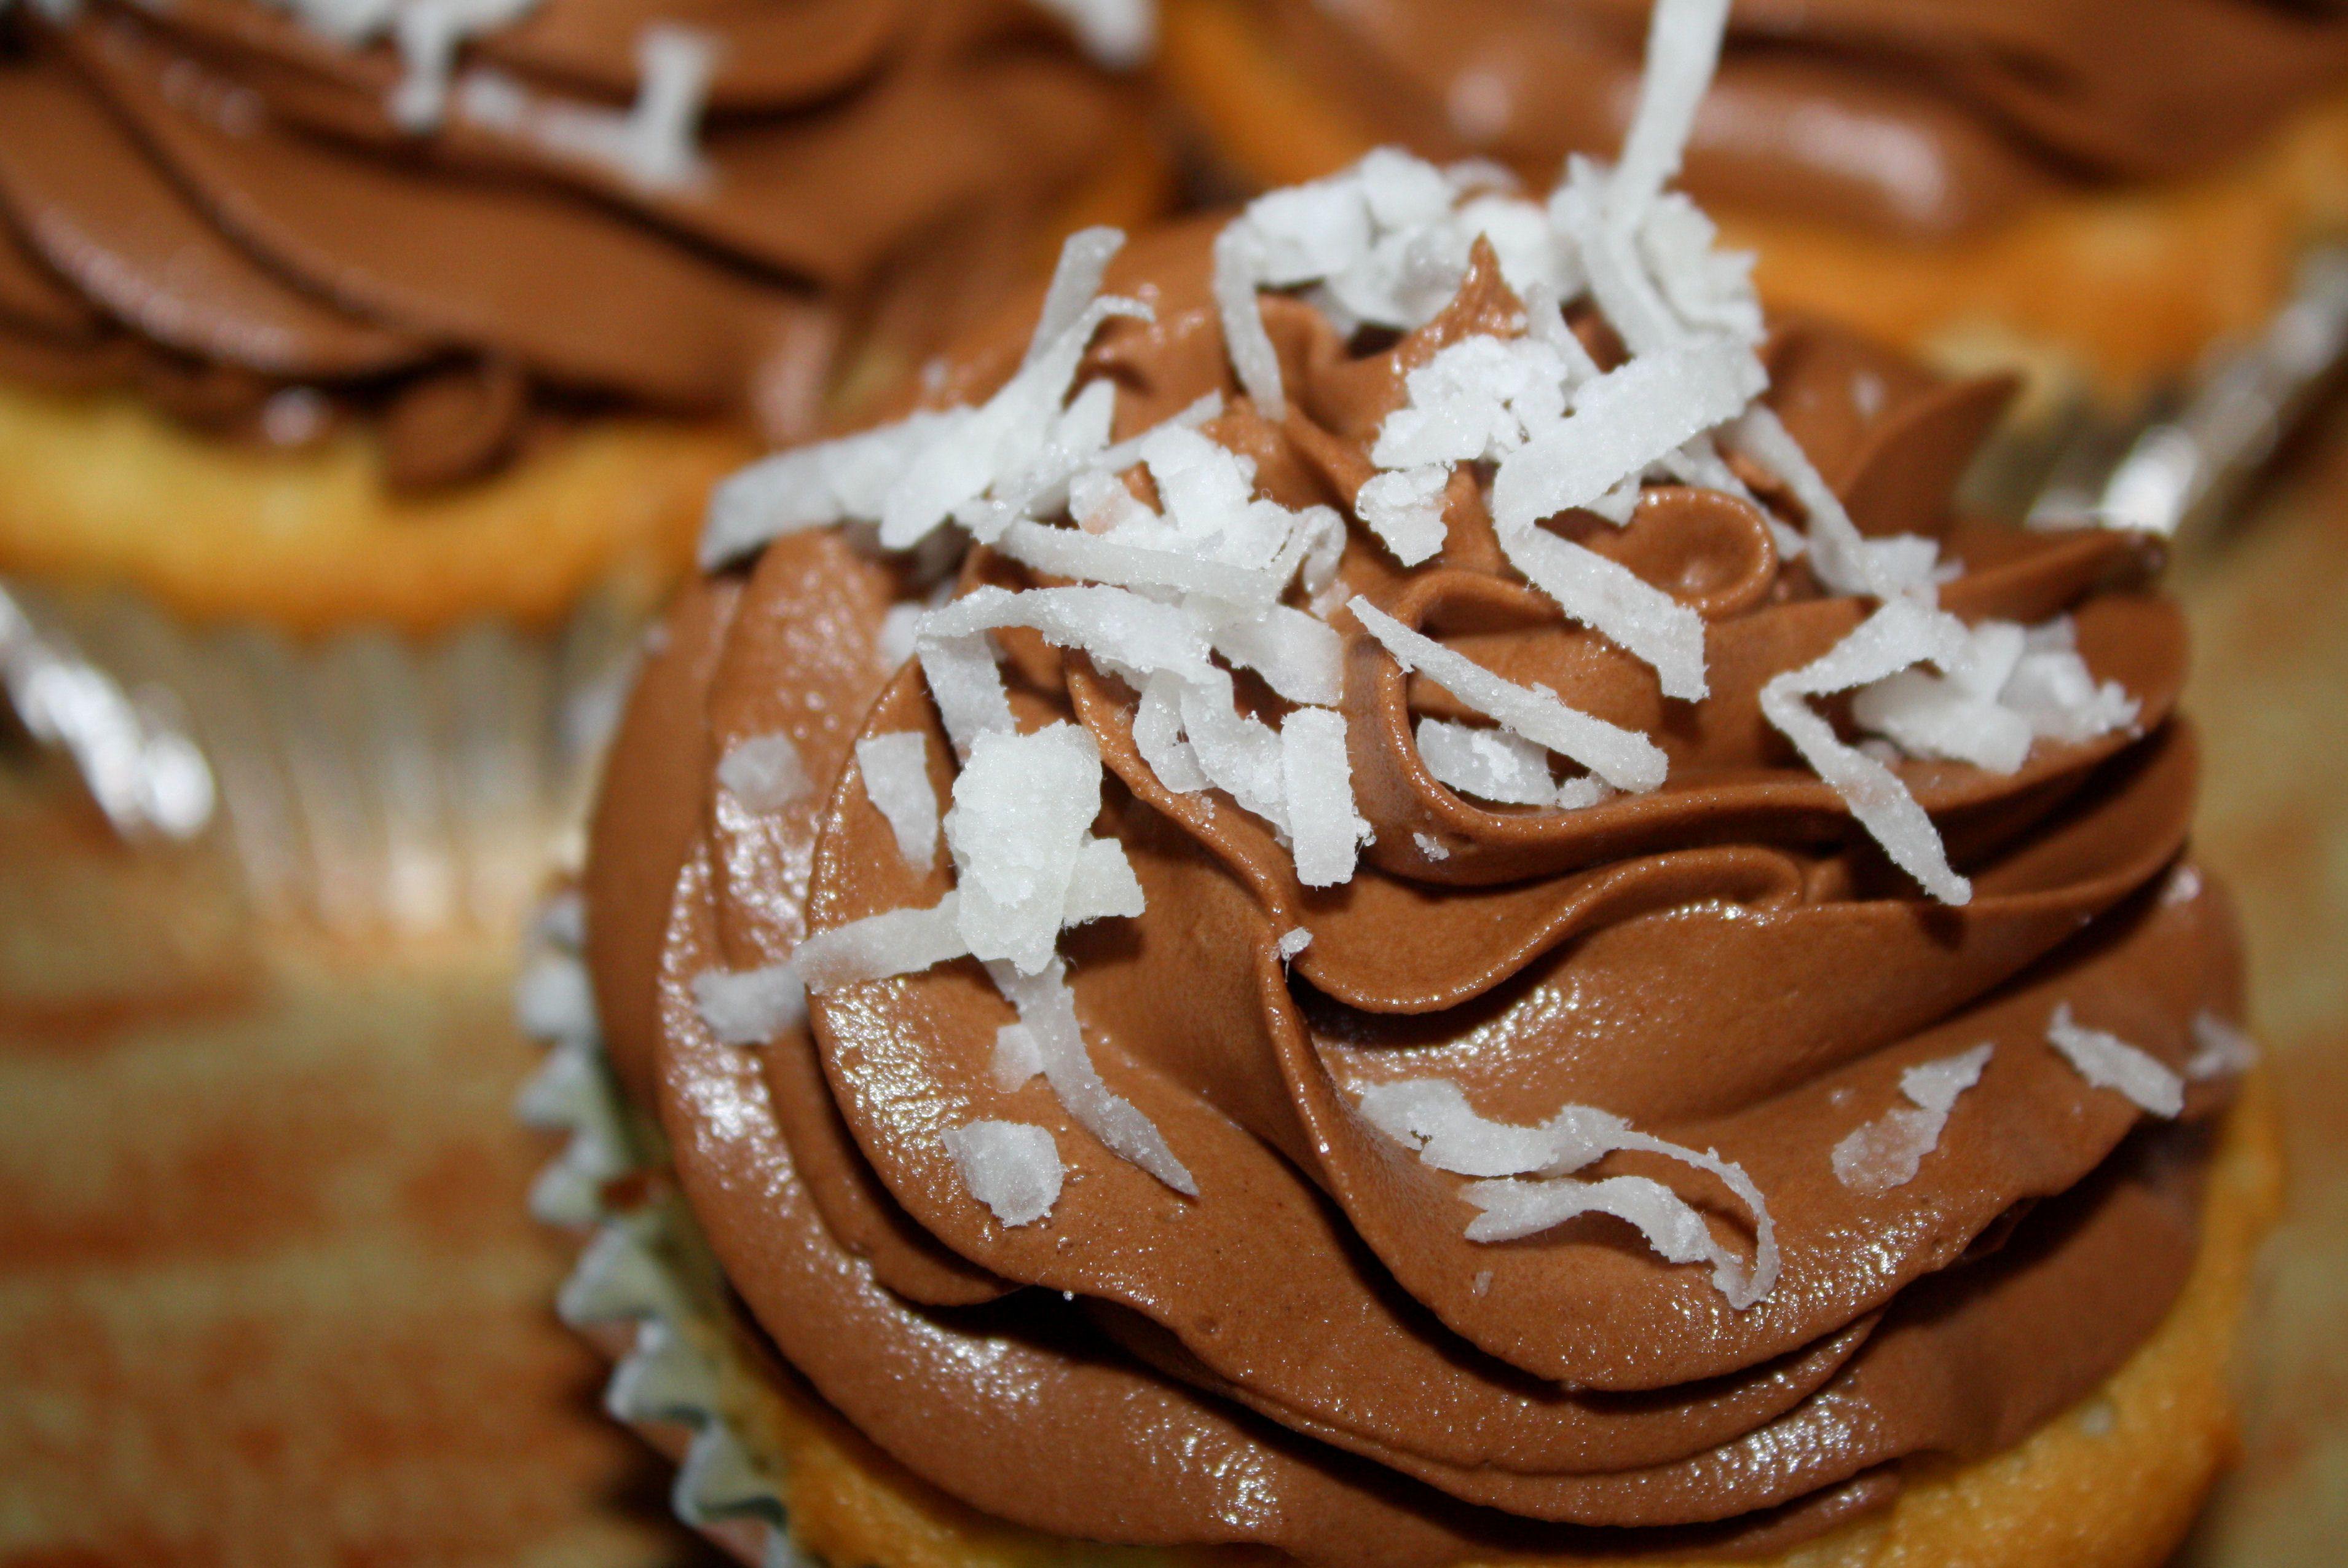 Wedding Cupcakes (Sweet Coconut cake, Chocolate ganache filling w/toasted coconut, chocolate buttercream, shredded sweet coconut)